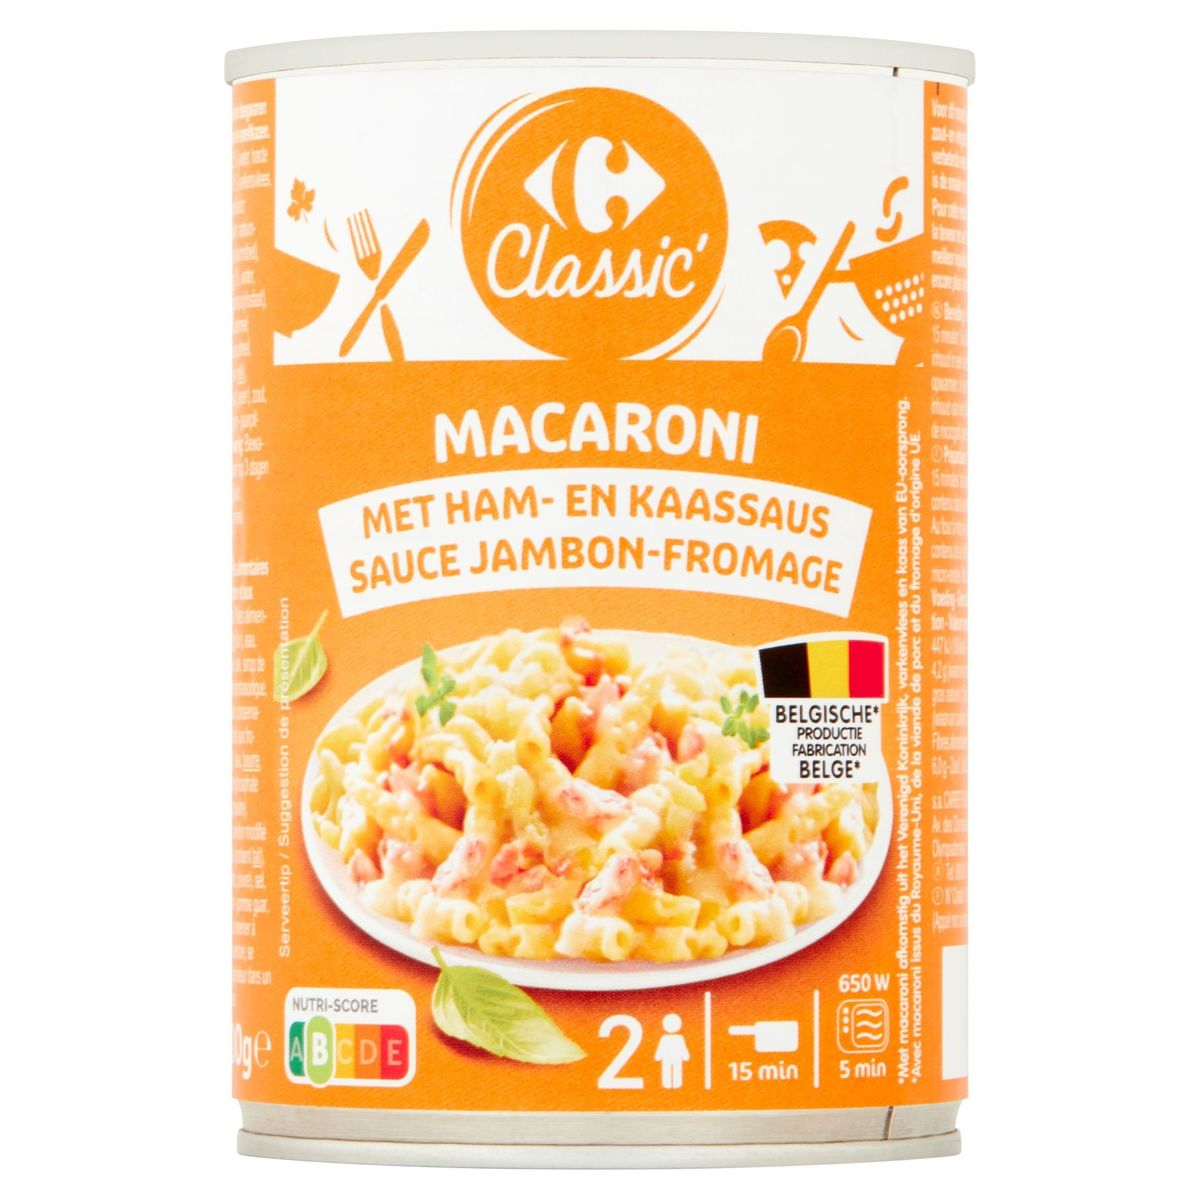 Carrefour Classic' Macaroni Sauce Jambon-Fromage 400 g